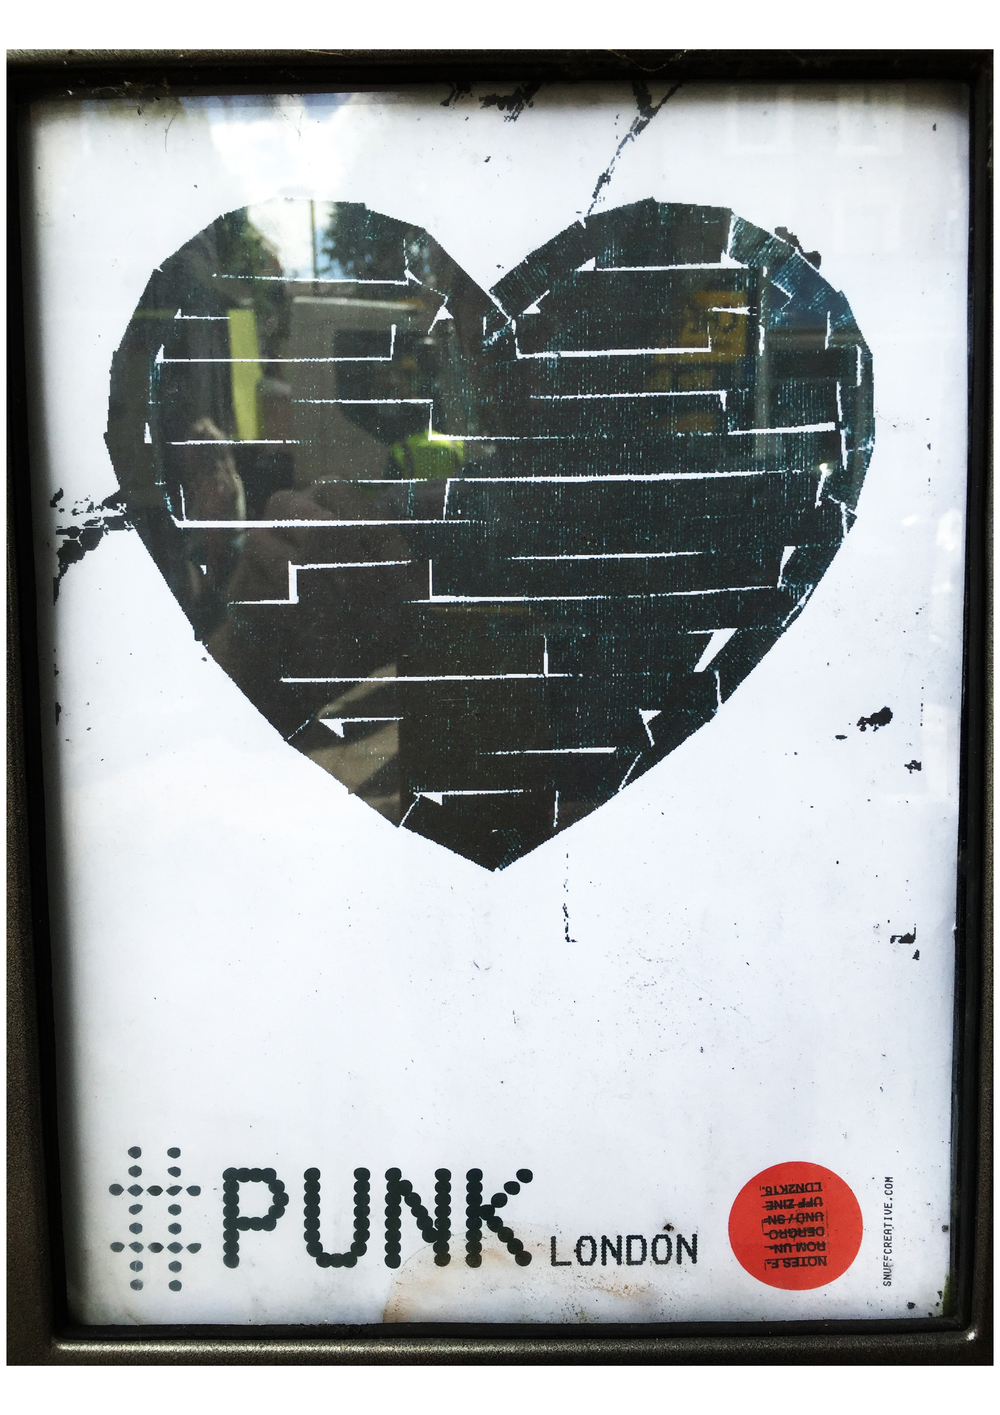 #PUNKLONDON \ DIY TAPE HEART \ SNUFF ZINE